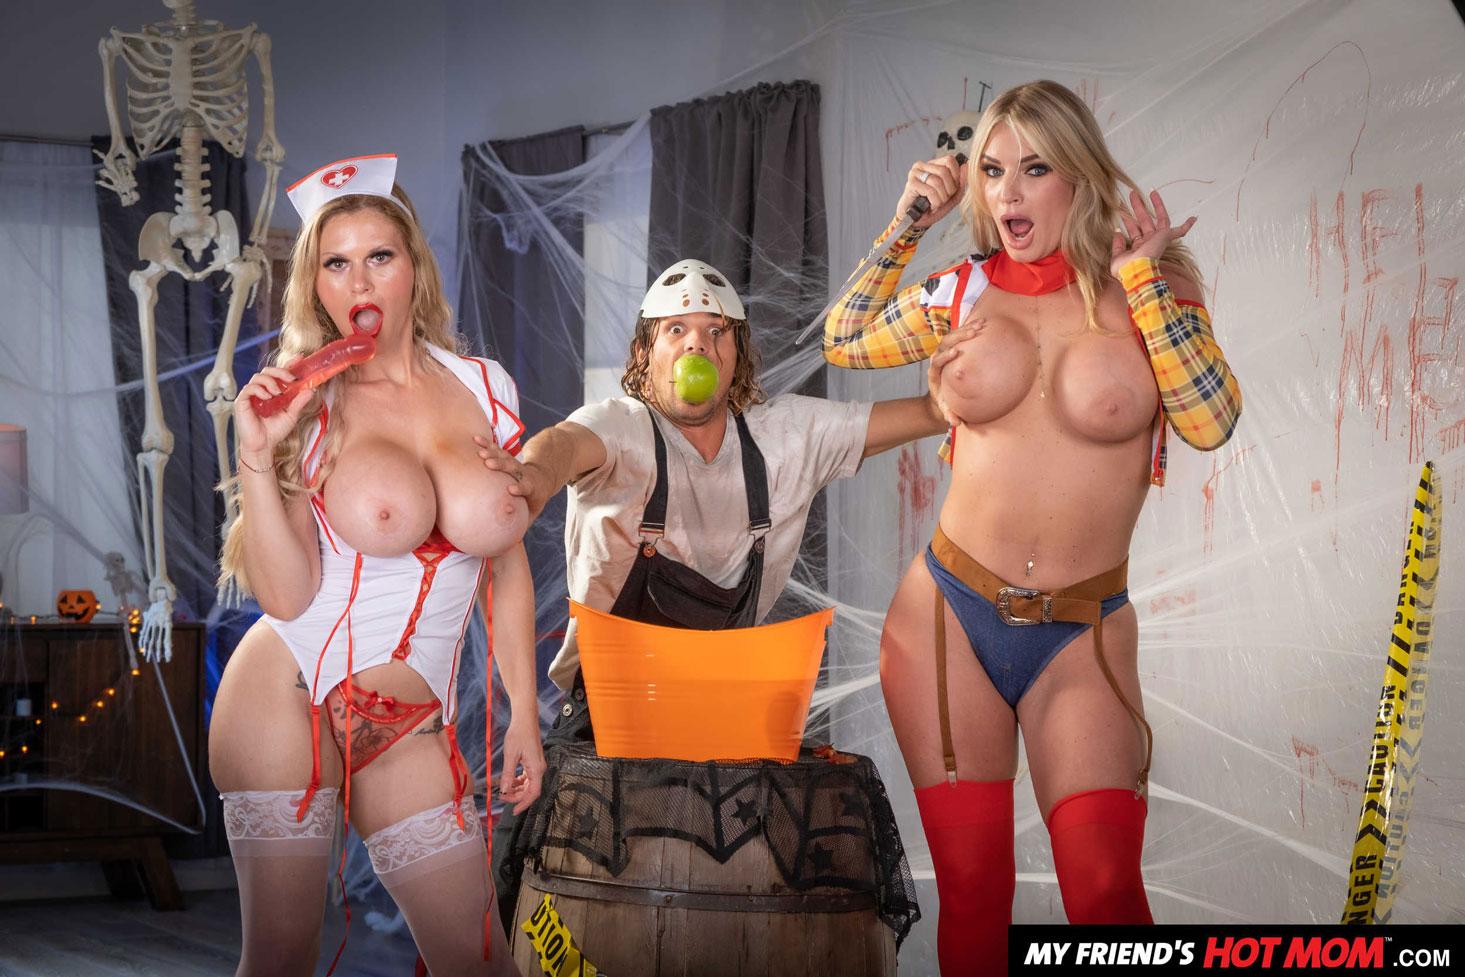 Naughty America - Casca Akashova & Rachel Cavalli Halloween Party 2